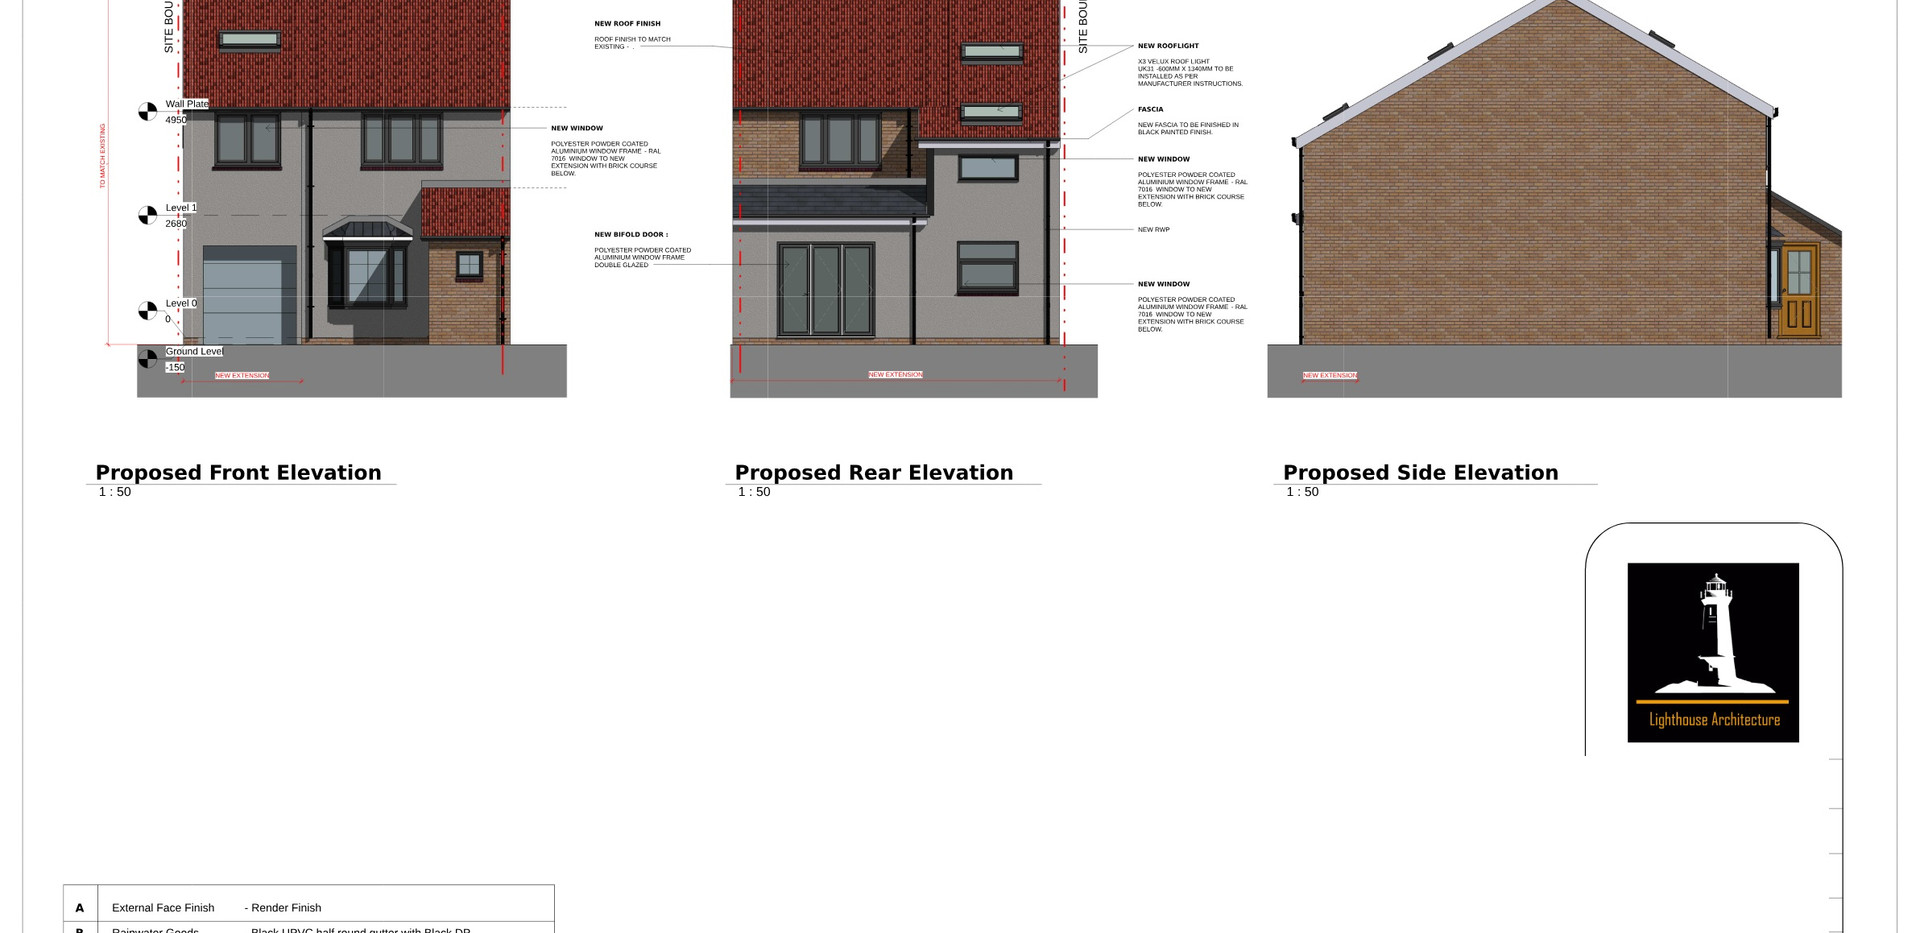 300-02 Proposed Elevations (2)-pdf.jpg